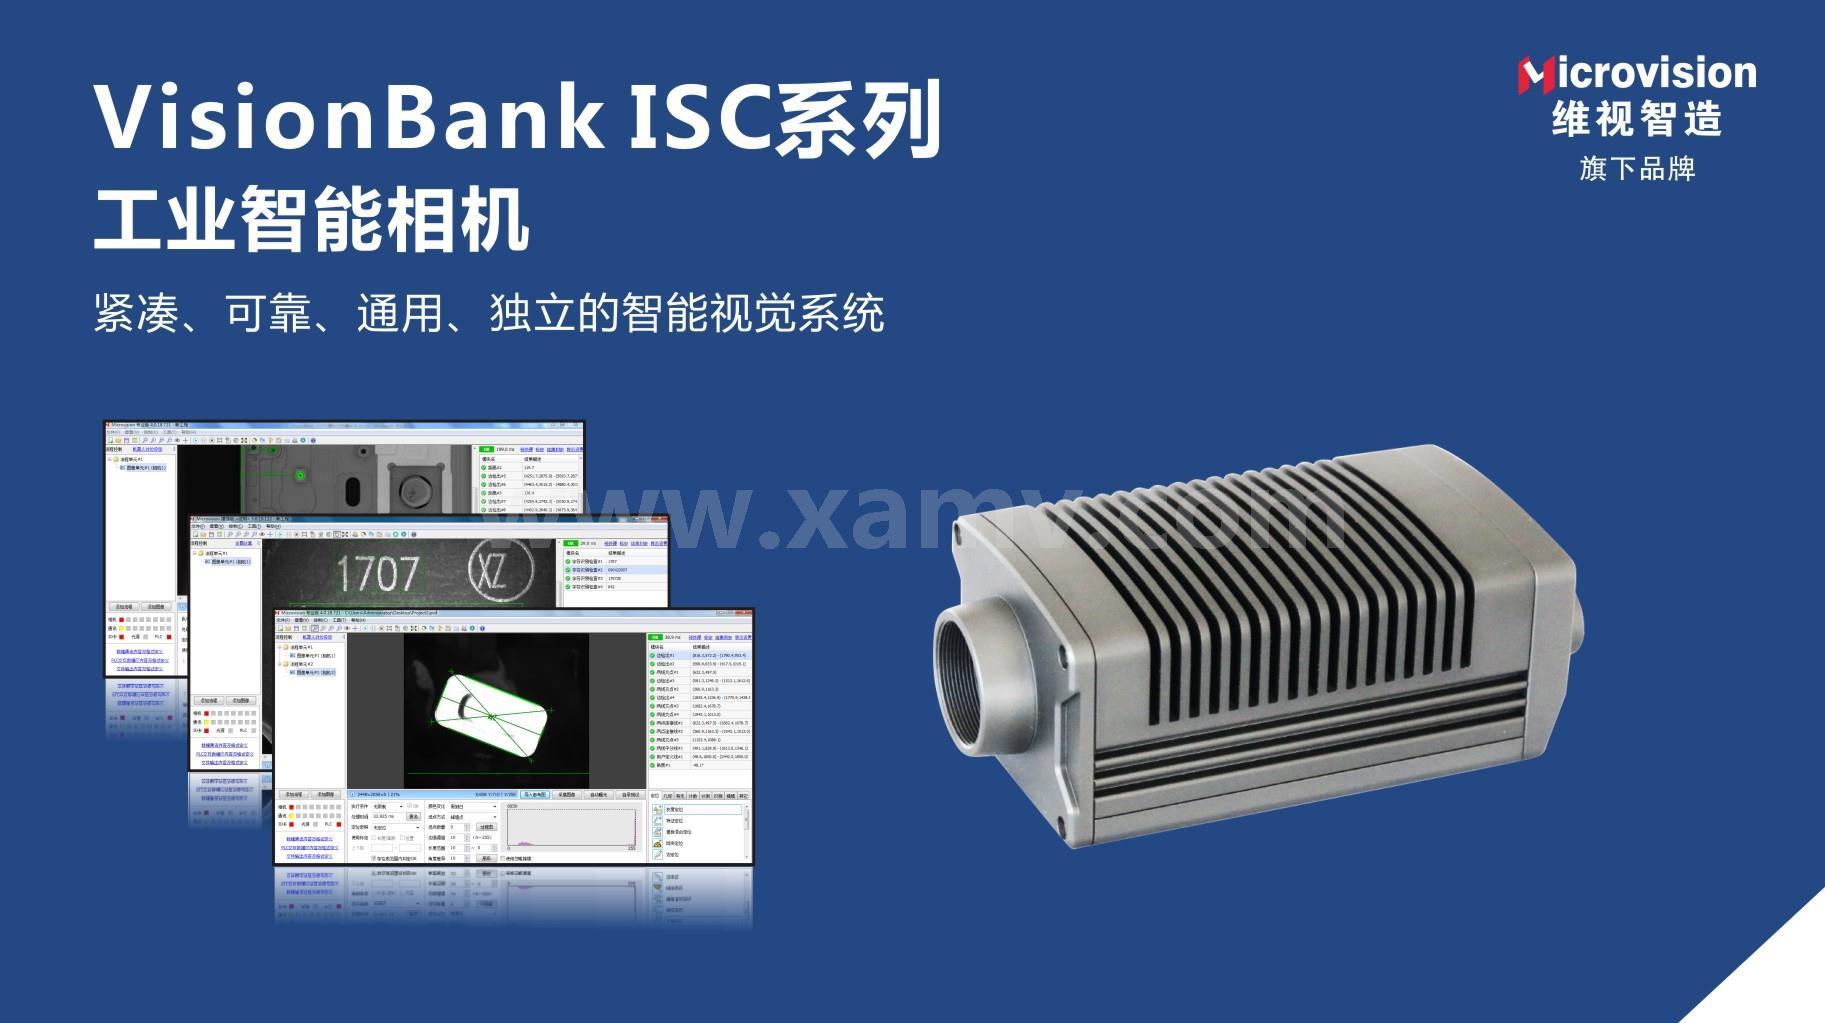 VisionBank ISC工业智能相機